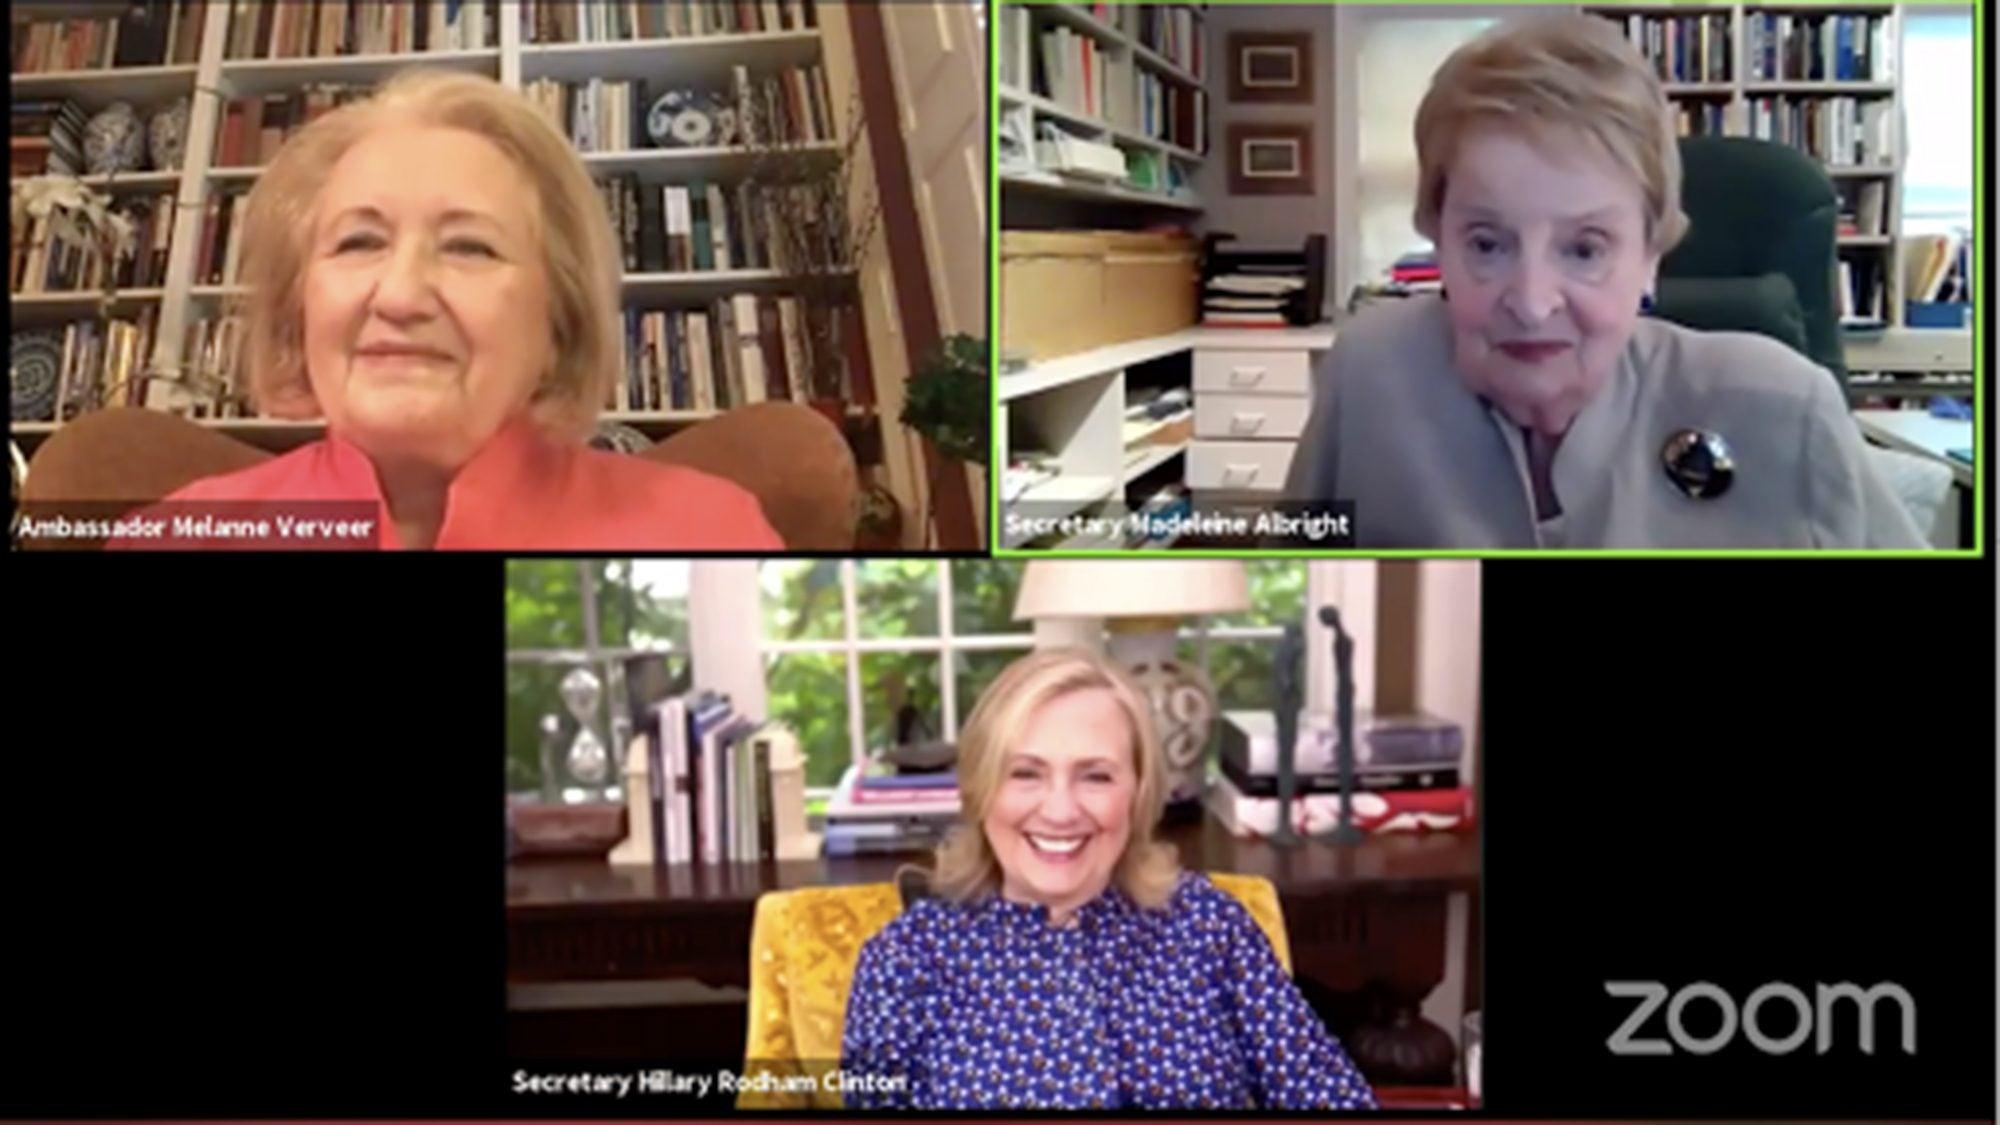 Melanne Verveer, Madeleine Albright and Hillary Rodham Clinton on Zoom